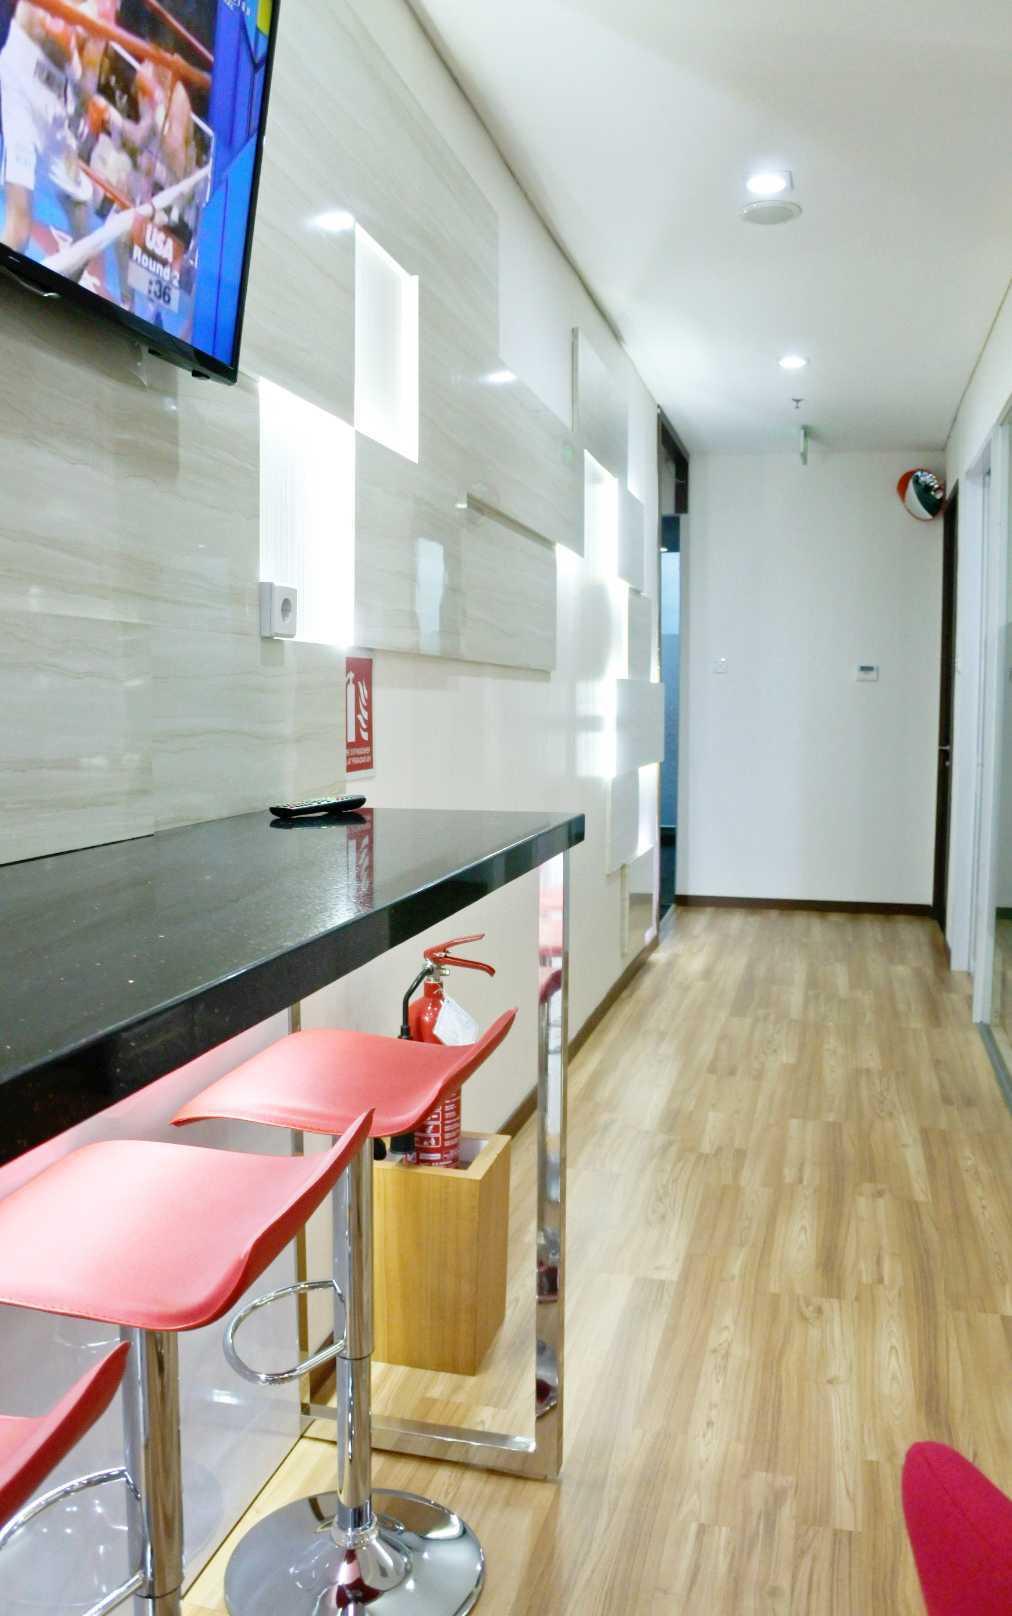 Bsds Wood Group Office Jl. Casablanca No.kav. 88, Rt.16/rw.5, Menteng Dalam, Tebet, Kota Jakarta Selatan, Dki Jakarta 12870, Indonesia Jl. Casablanca No.kav. 88, Rt.16/rw.5, Menteng Dalam, Tebet, Kota Jakarta Selatan, Dki Jakarta 12870, Indonesia 3   30491